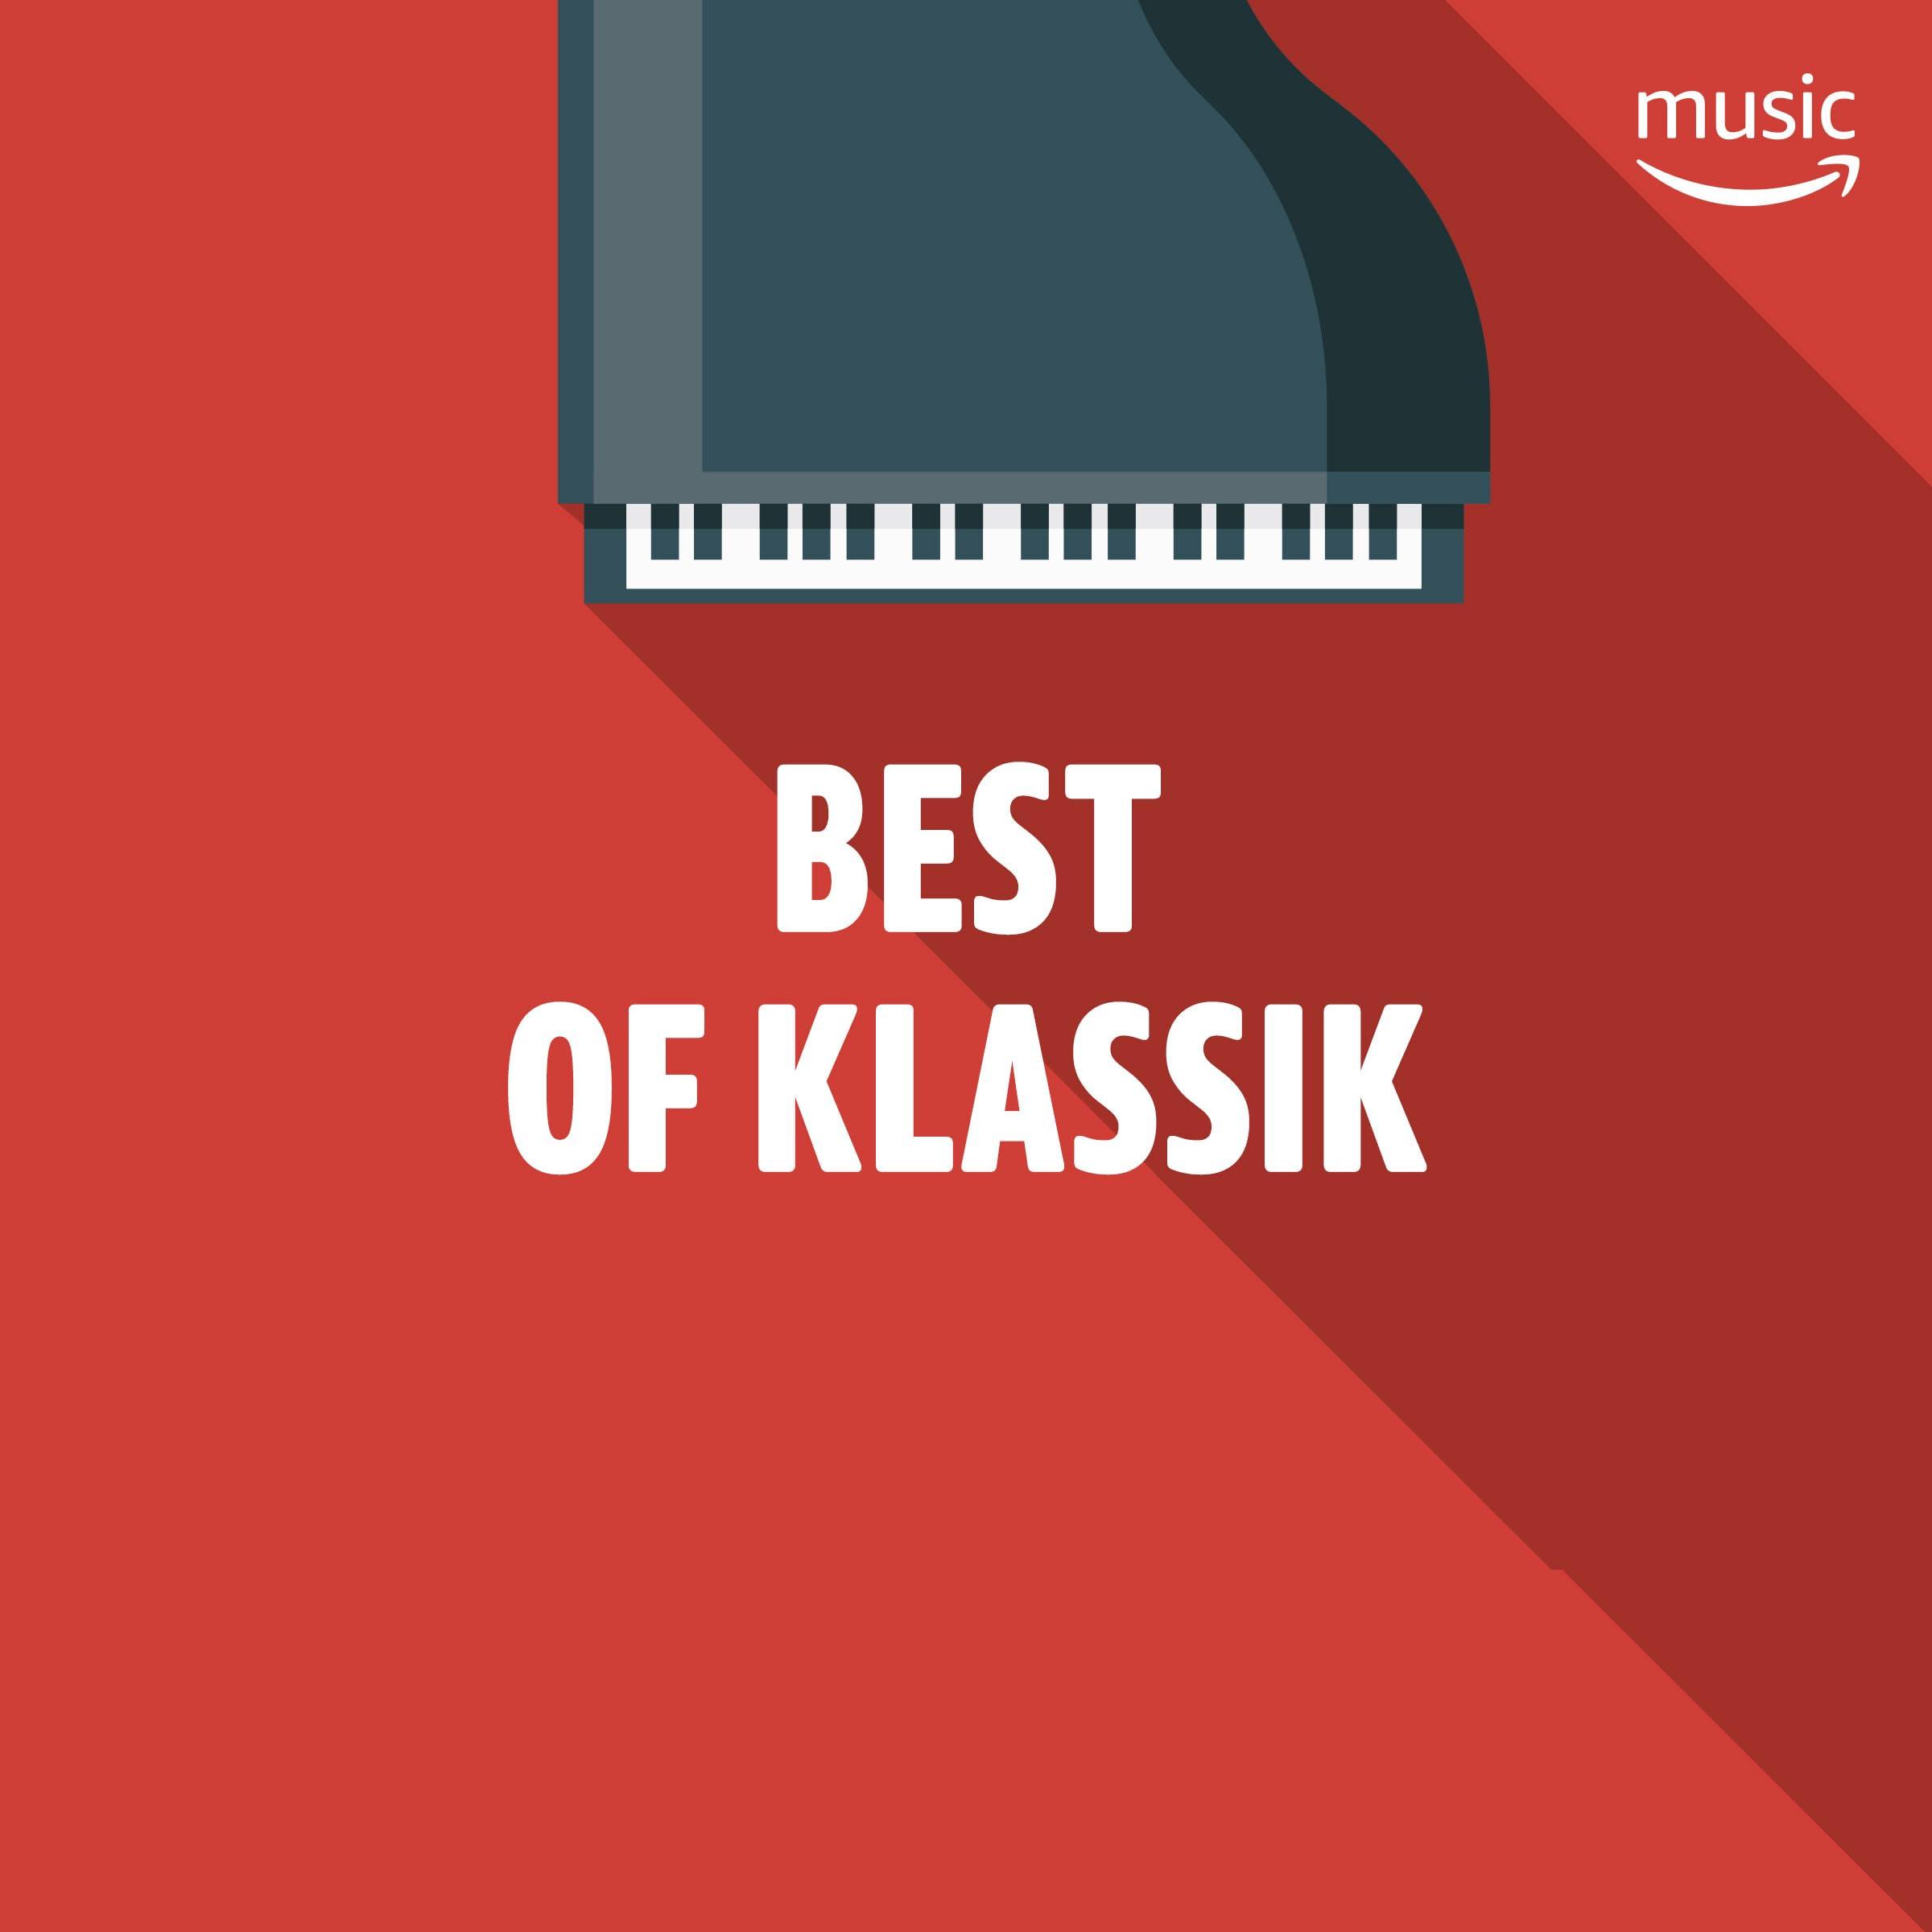 Best Of Klassik